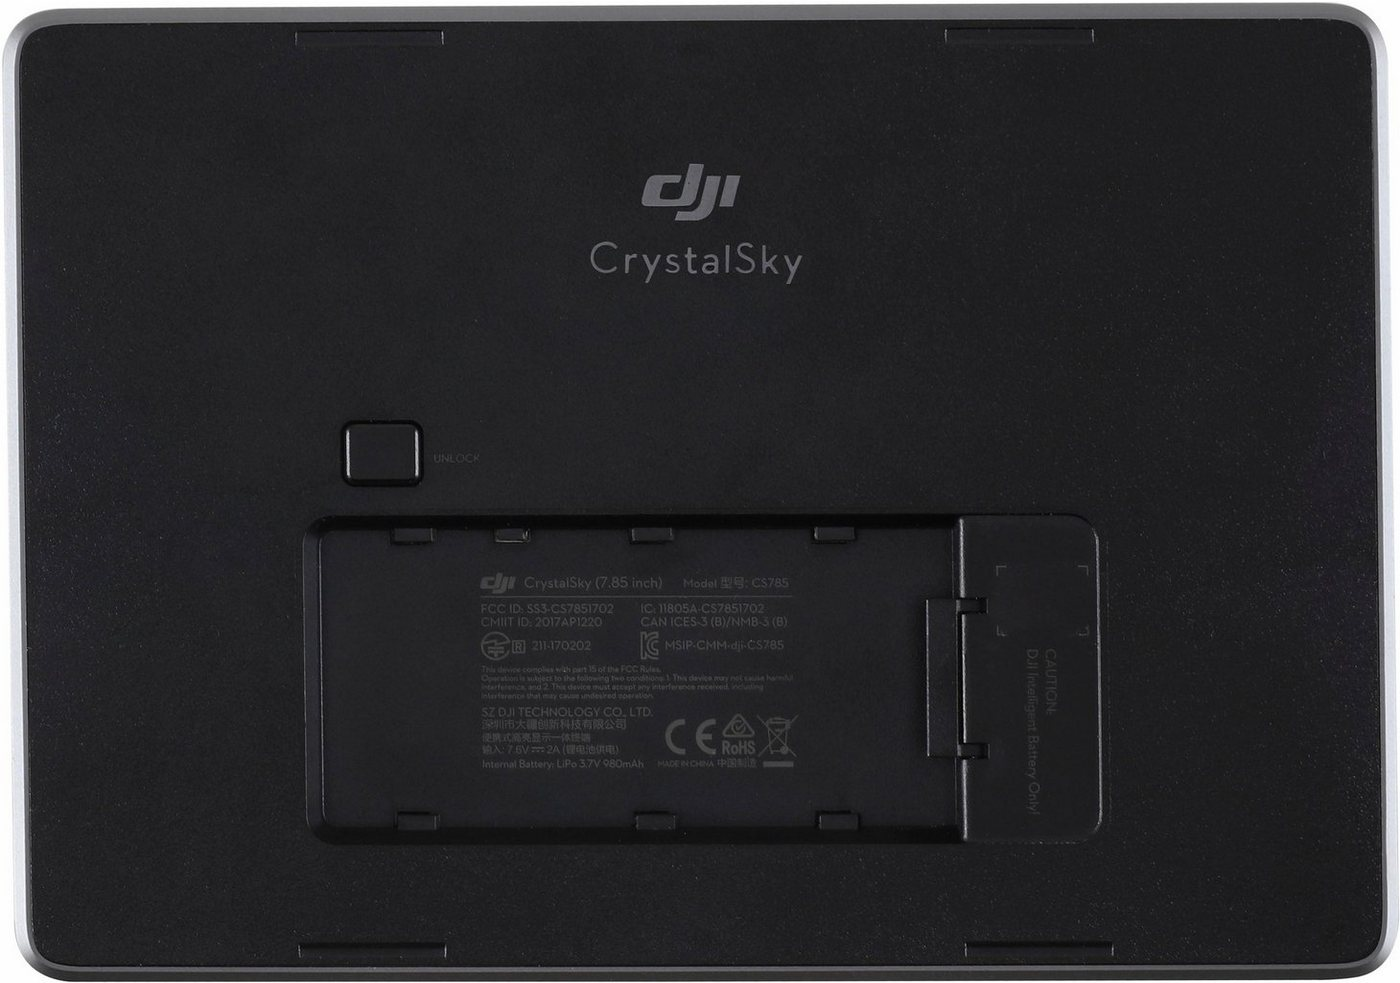 dji dji CrystalSky 785 DrohnenMonitor Full HD 60*